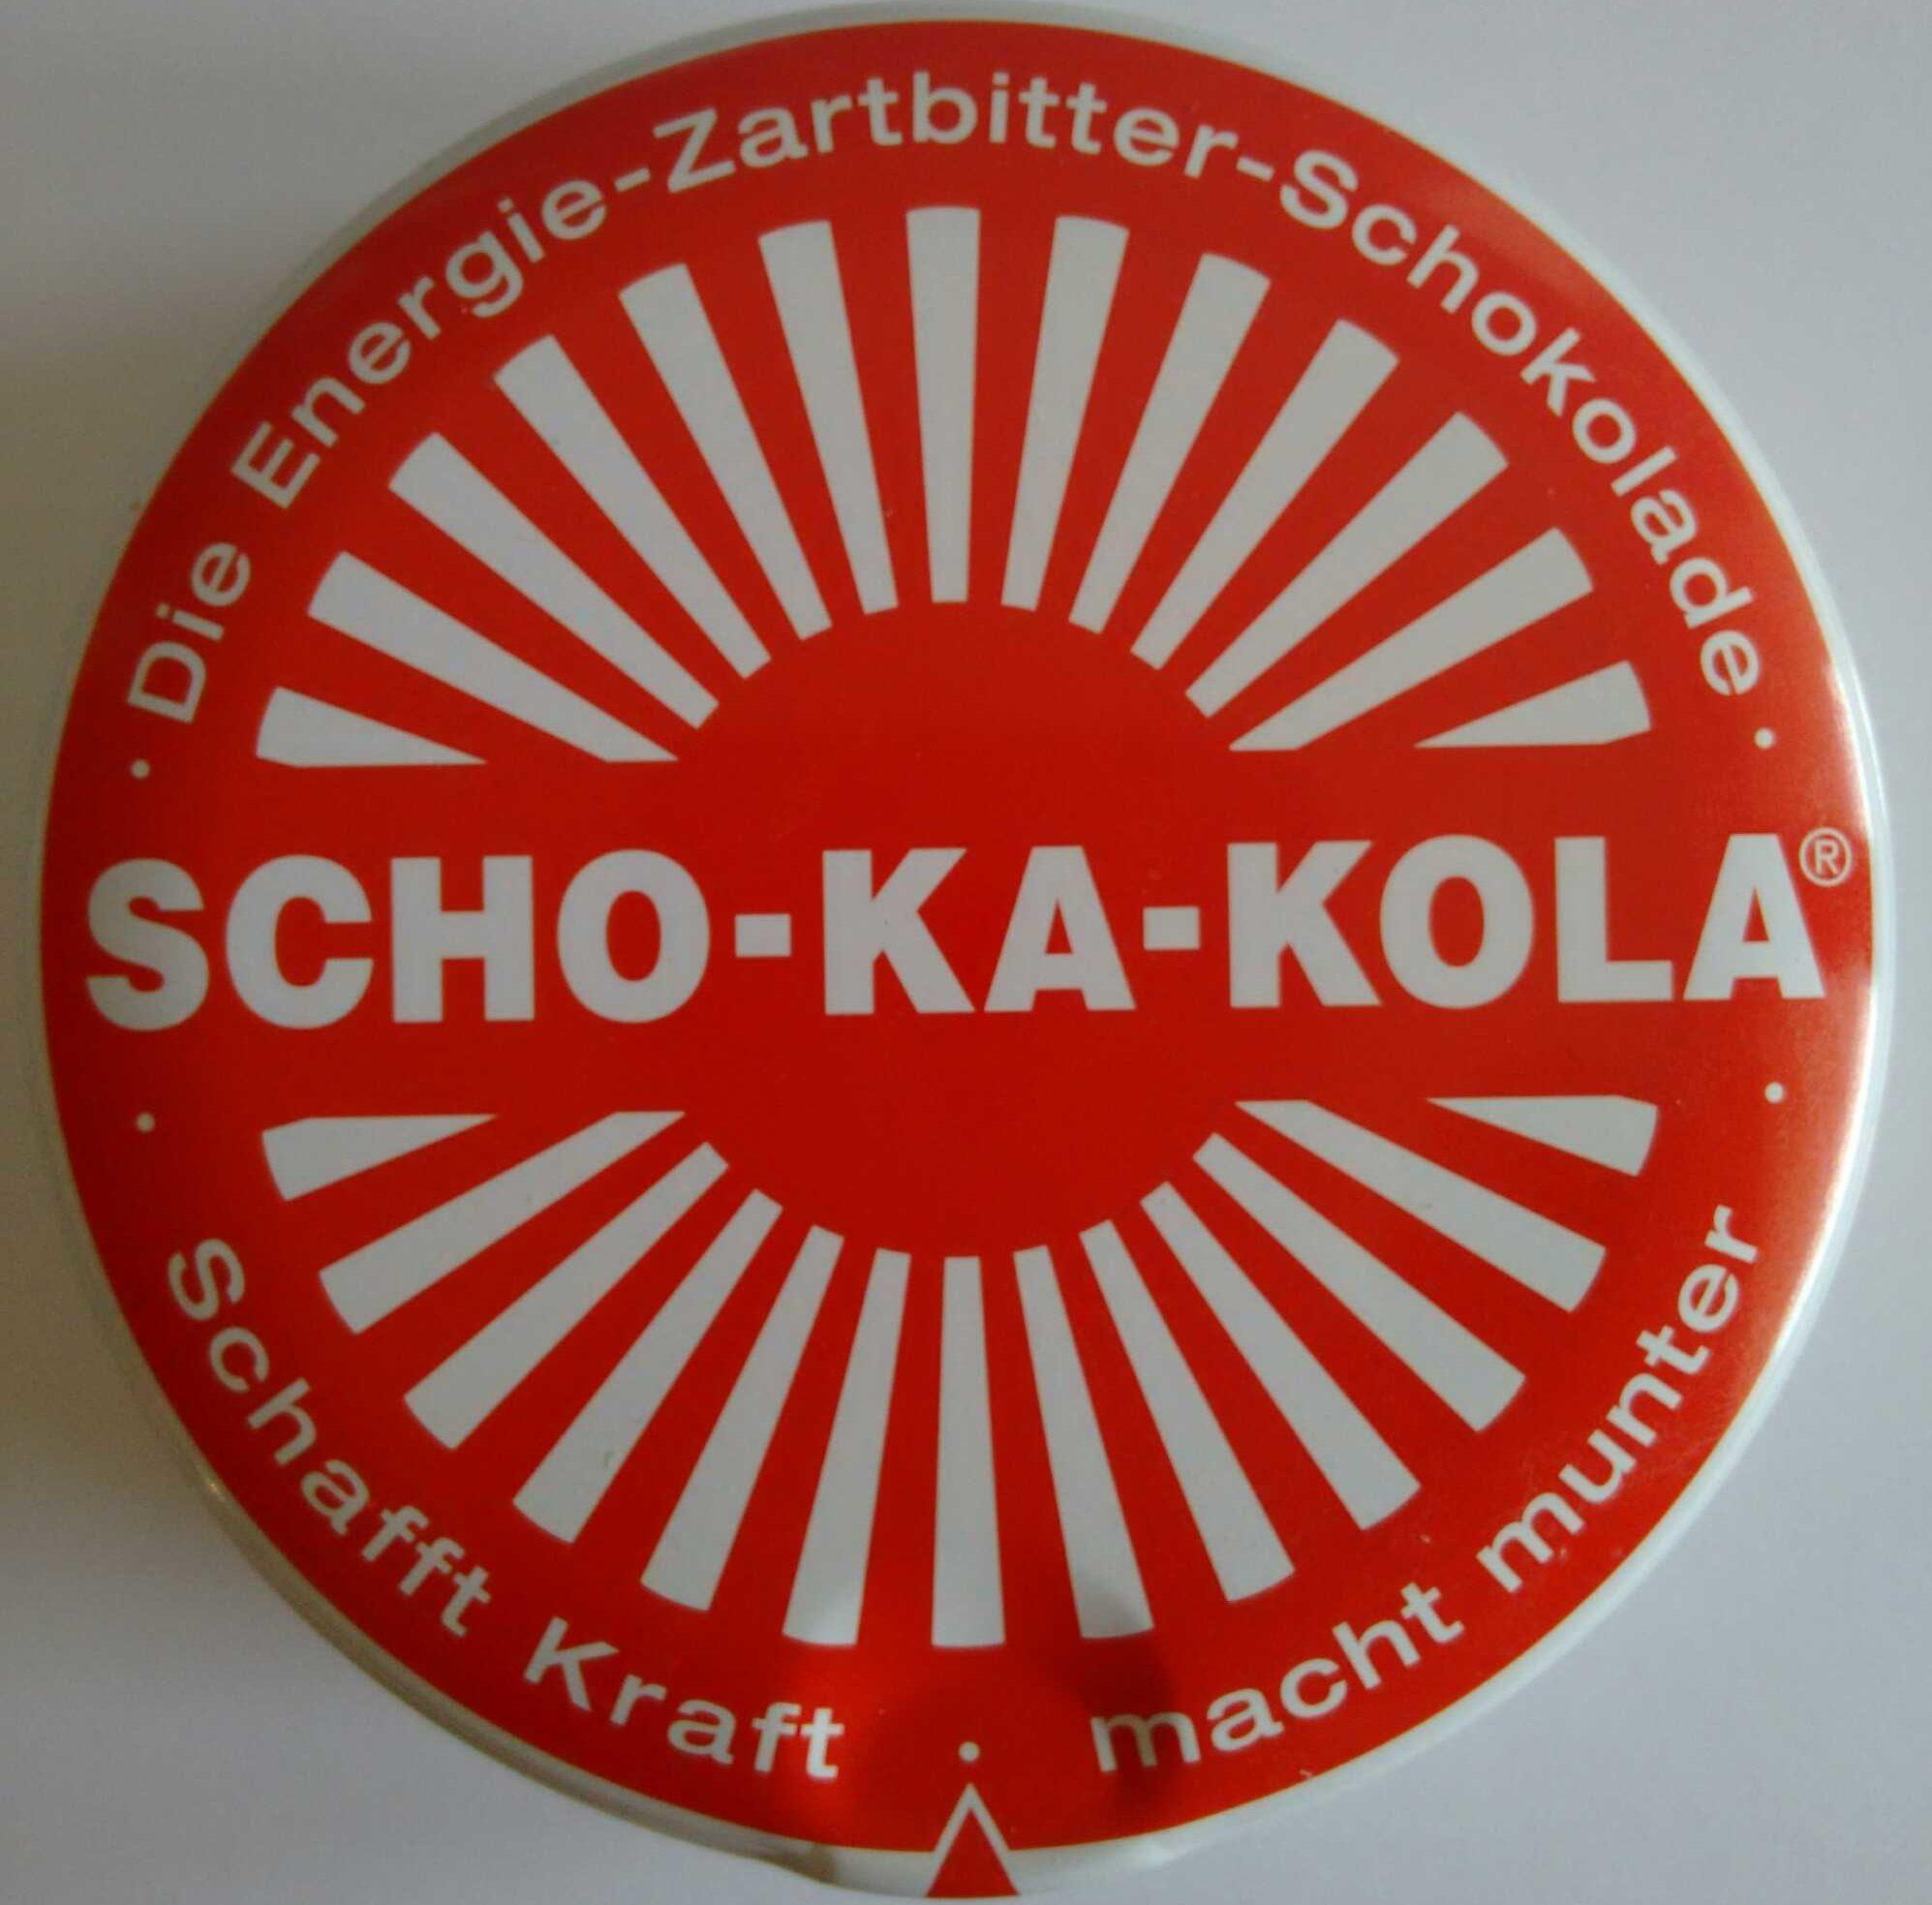 Scho-Ka-Kola - Product